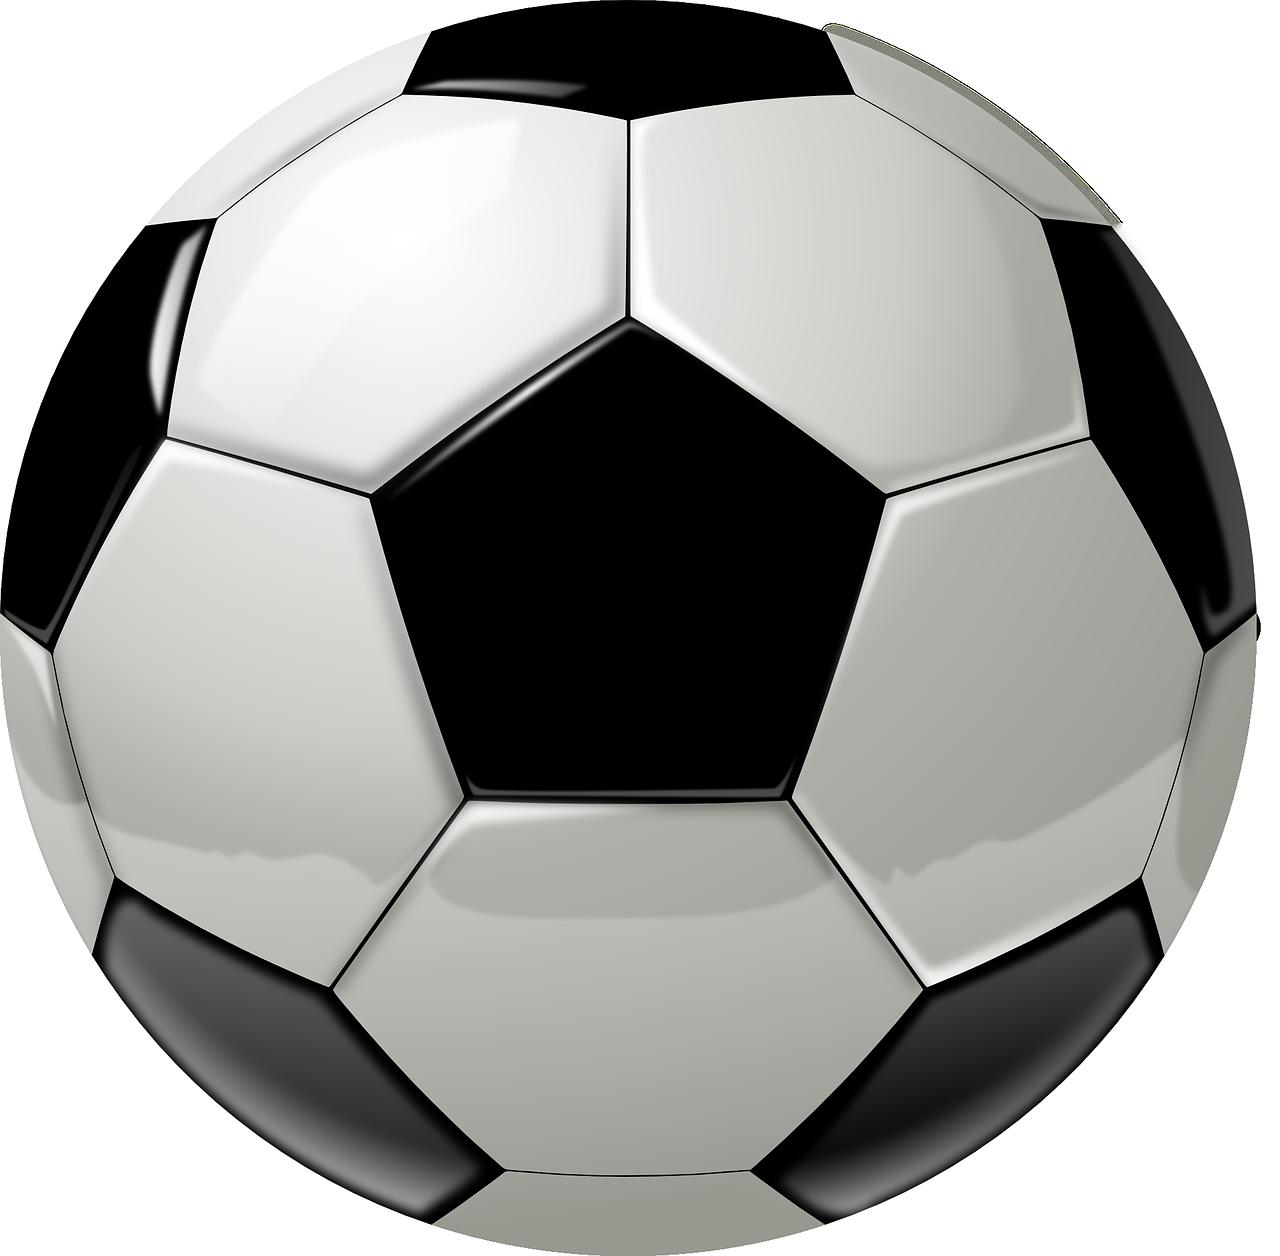 Png Fussball Transparent Fussball Png Images Pluspng